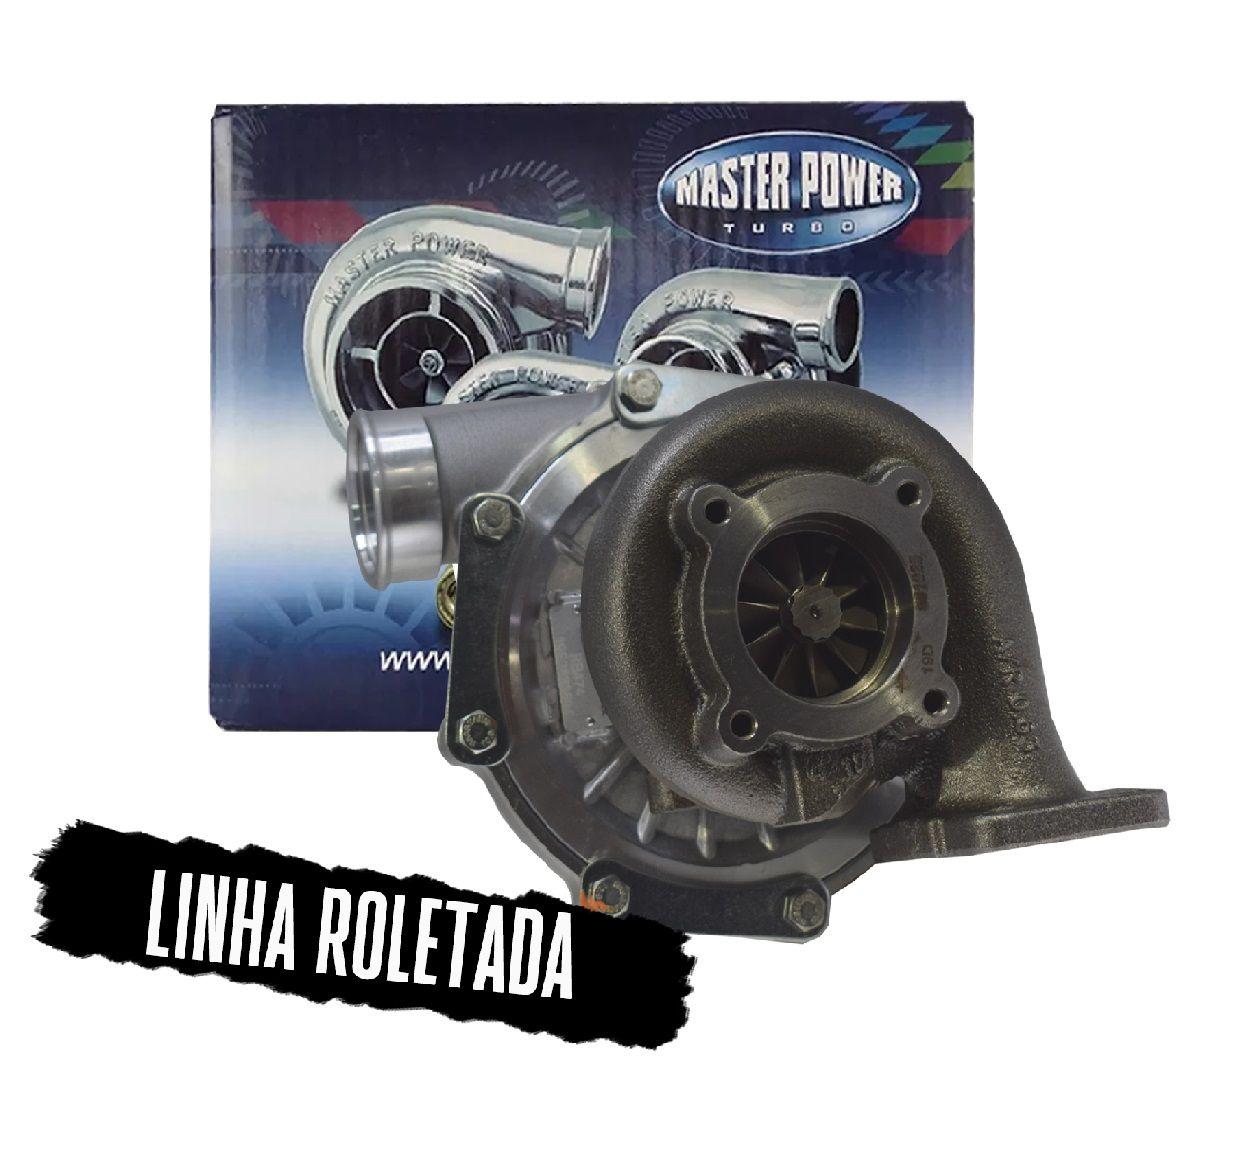 TURBINA ROLETADA / BEARING MASTER POWER - RB 474 .36